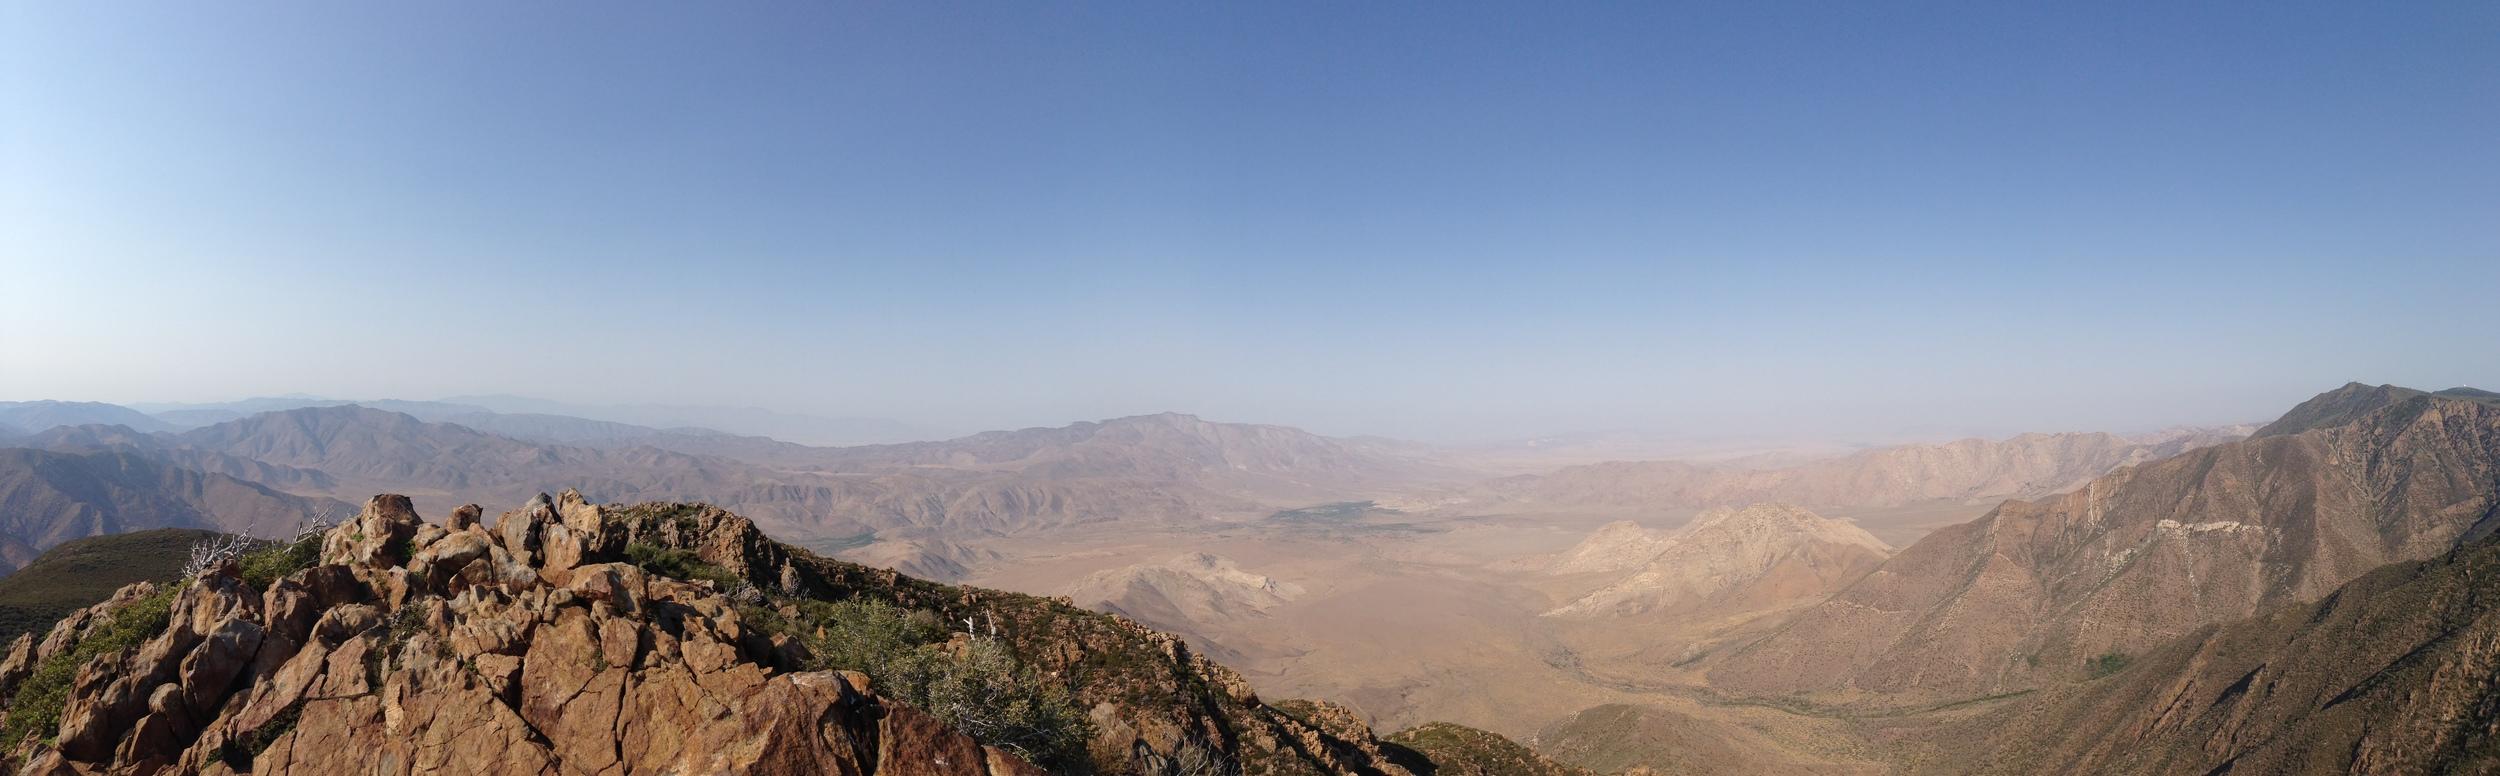 Part of the summit panorama of Garnet Peak, July 5, 2013